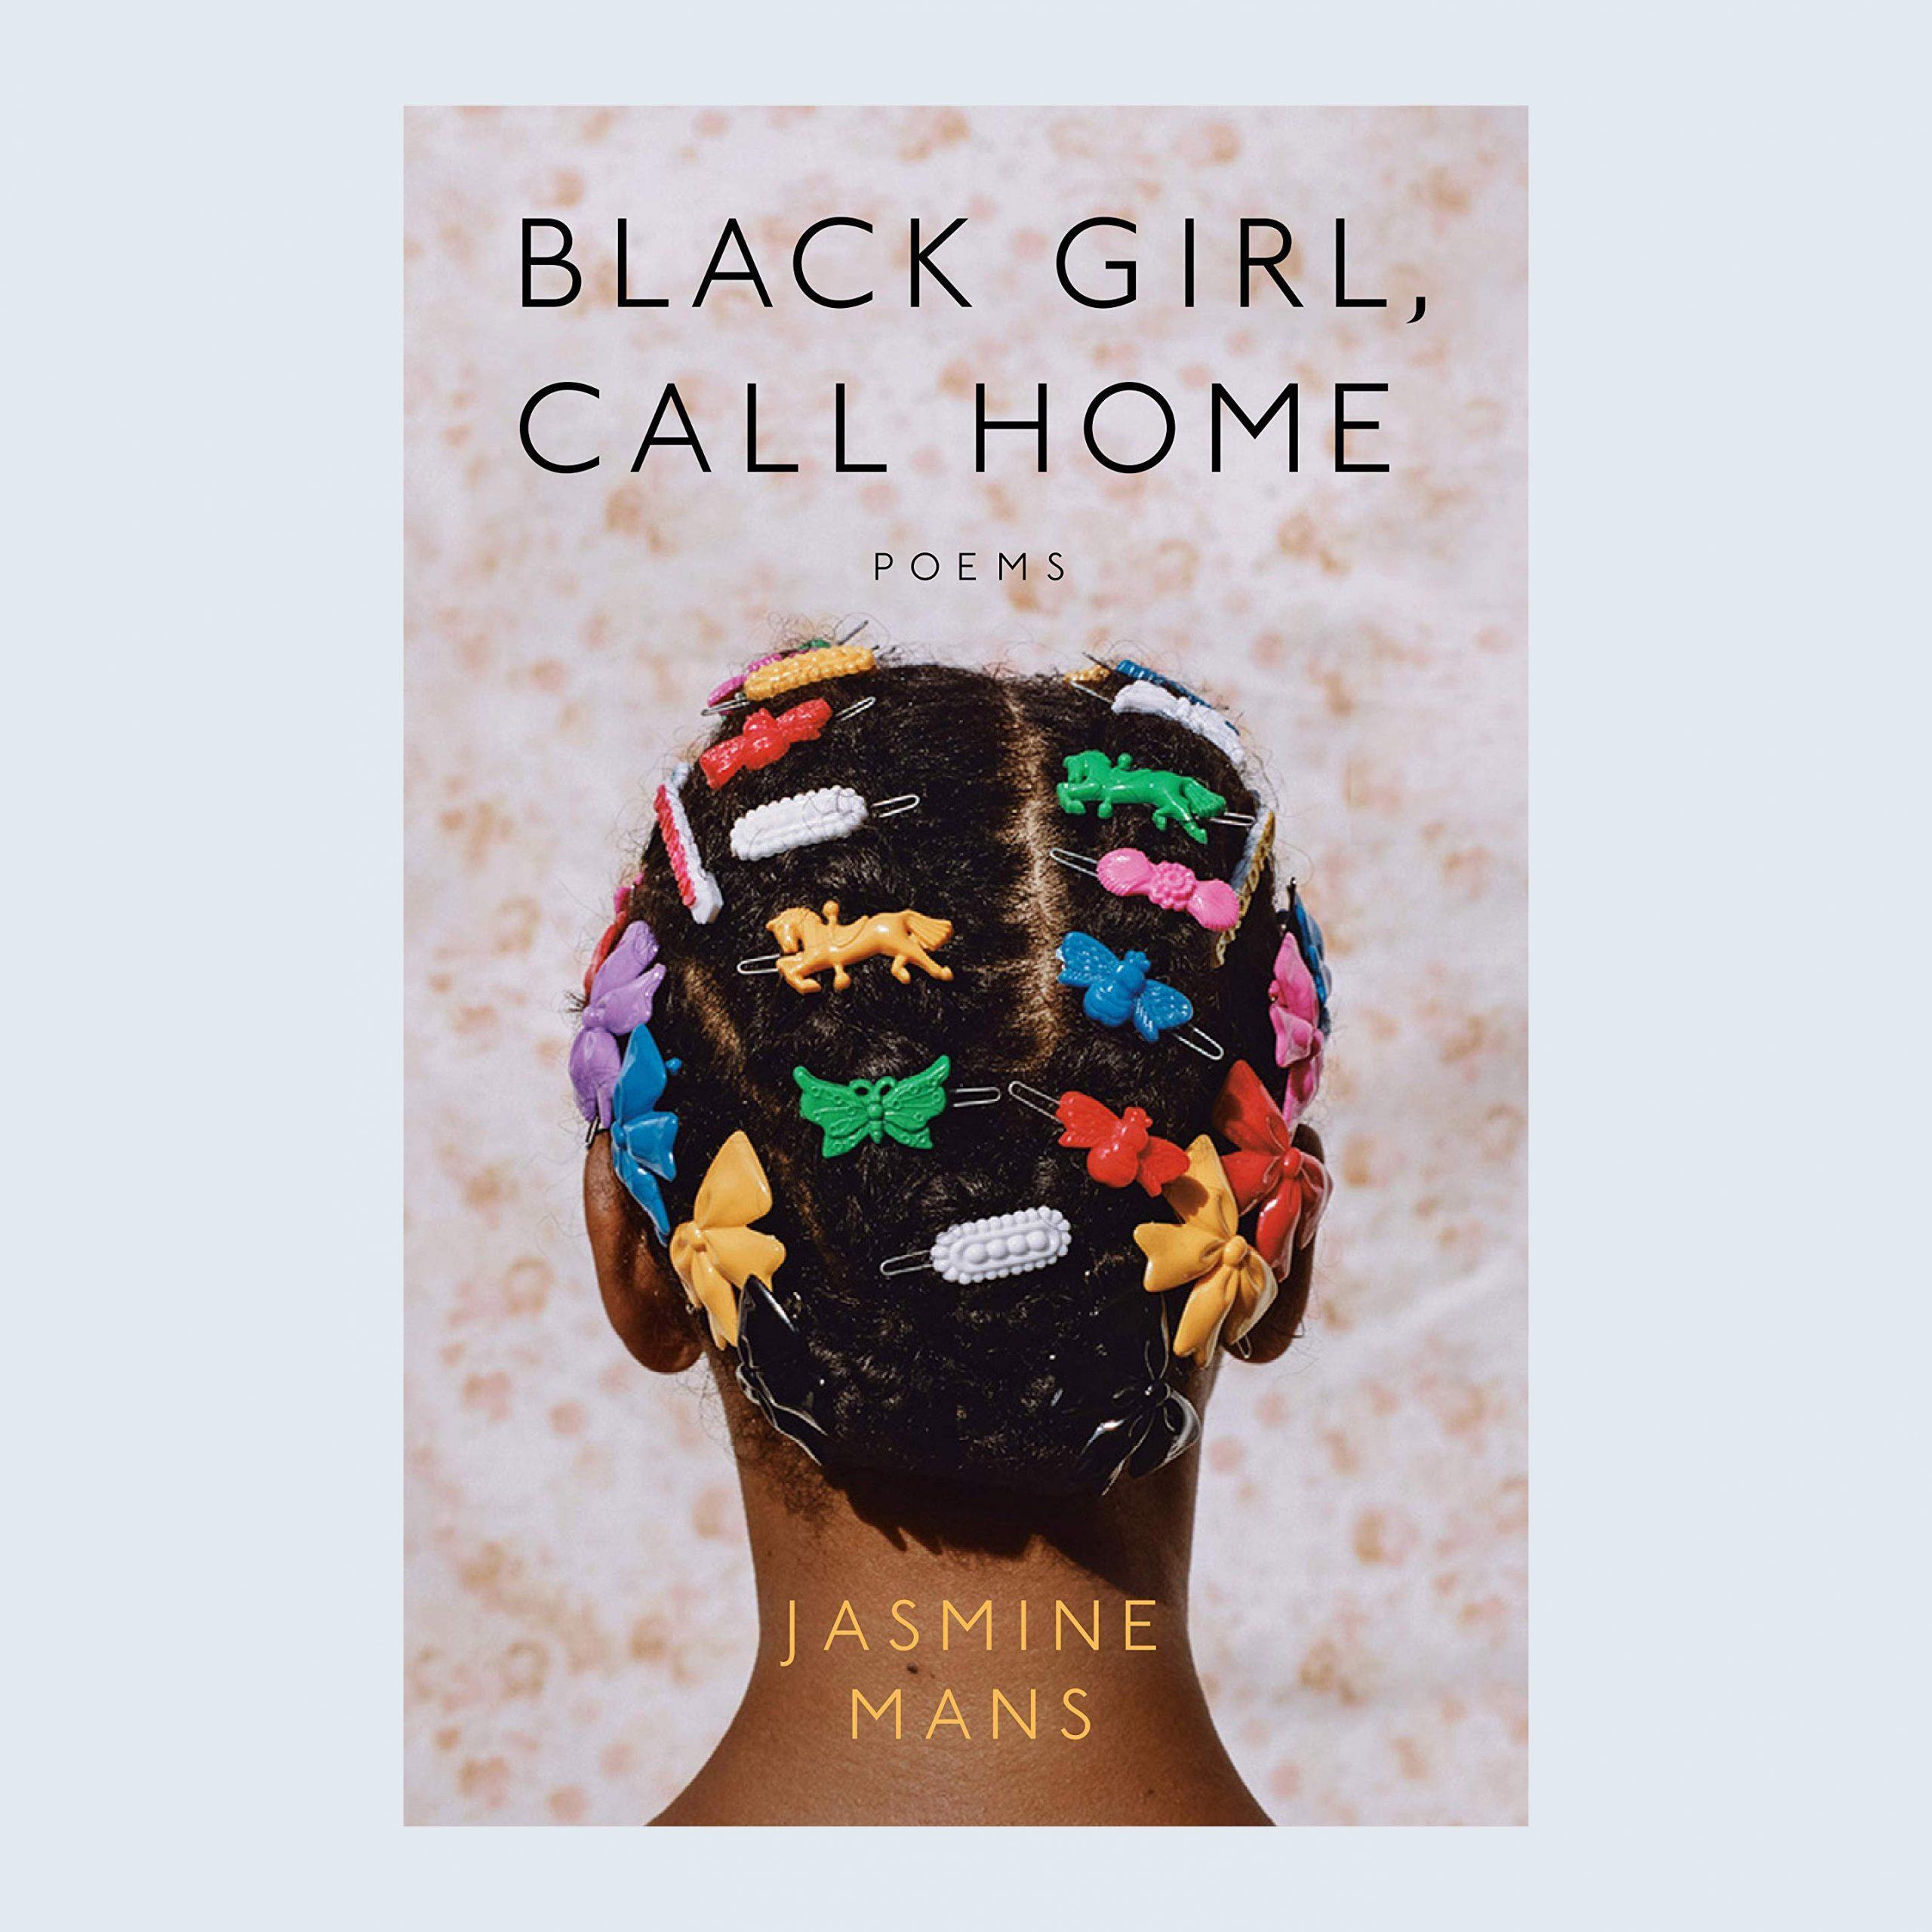 Black Girl Call Home by Jasmine Mans